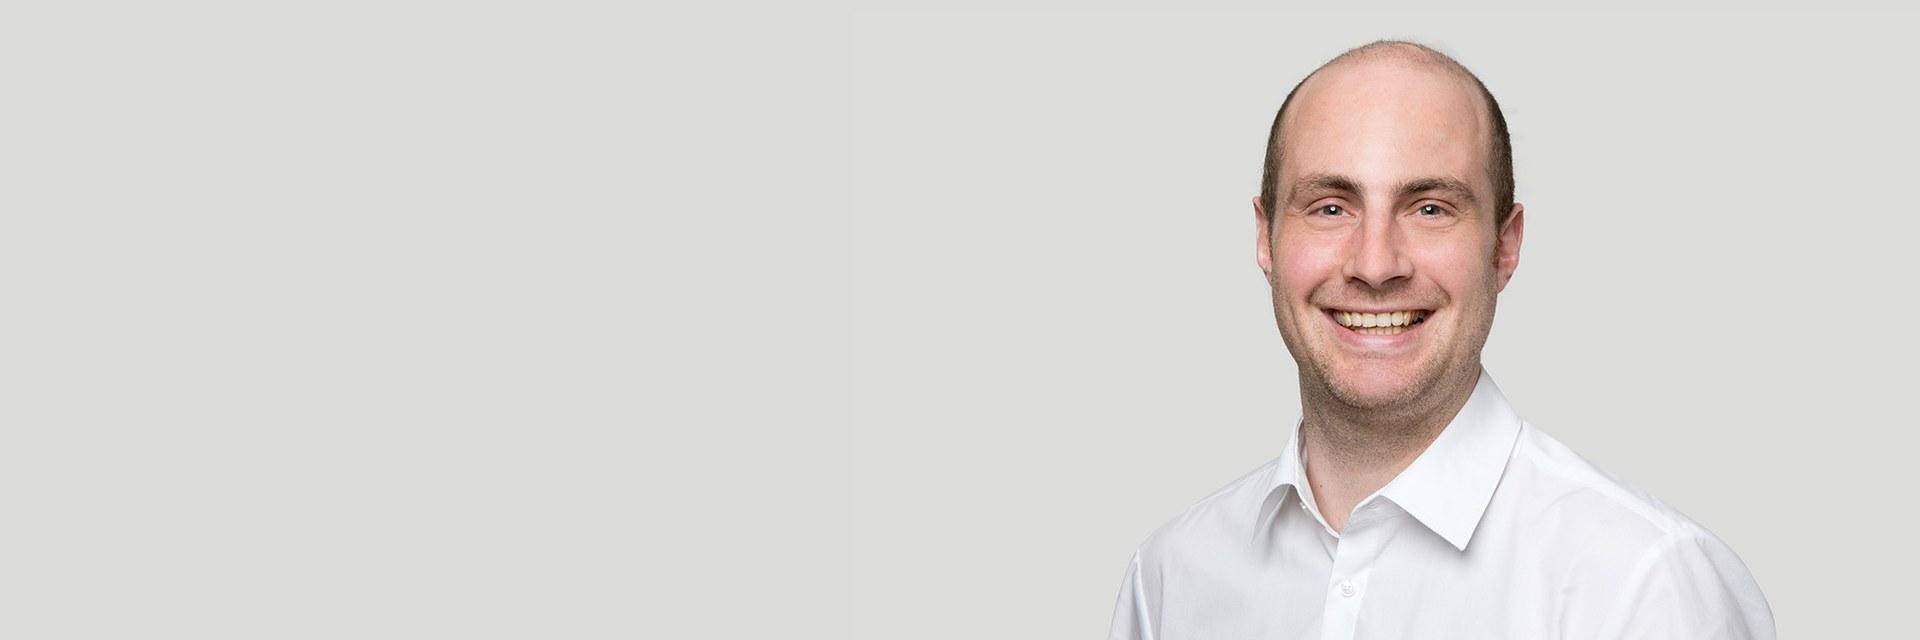 Dominik Tschopp, lic. phil.